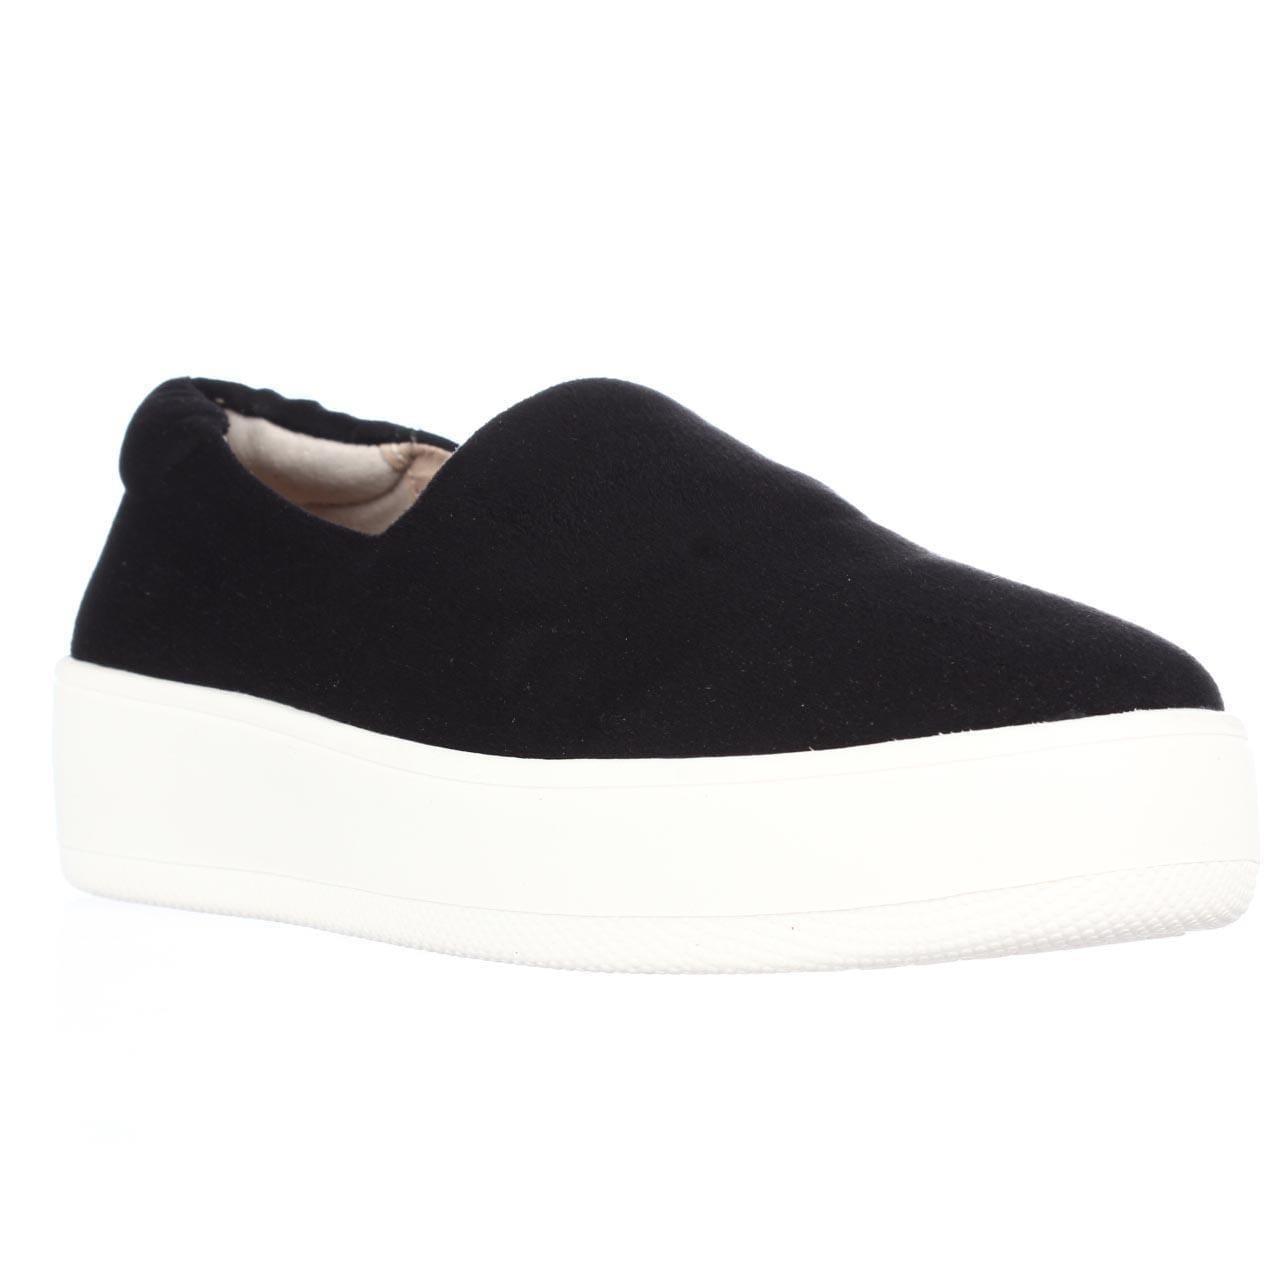 43505a5b452 STEVEN by Steve Madden Hilda Slip On Fashion Sneakers, Black